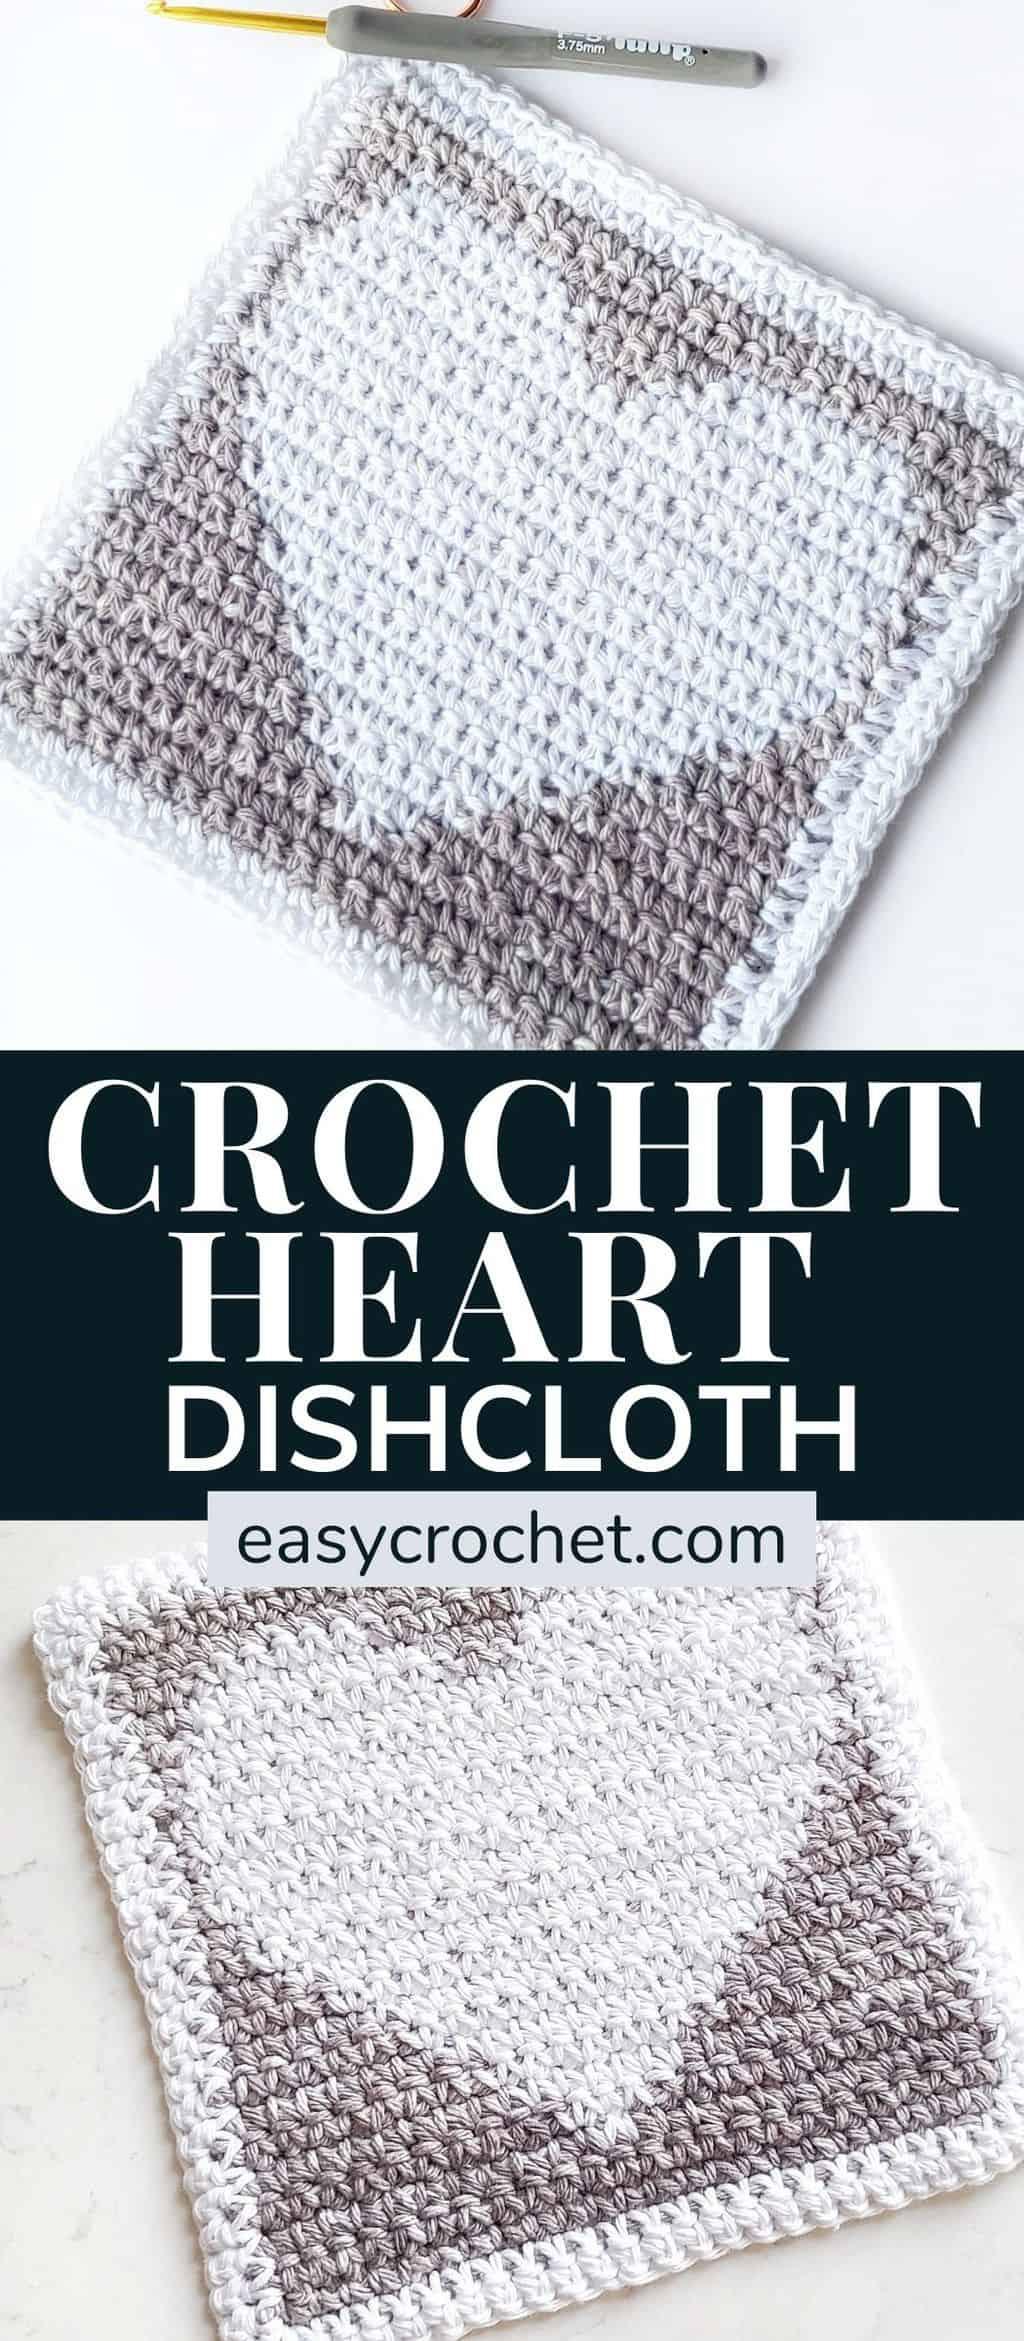 Crochet Heart Dishcloth Pattern via @easycrochetcom